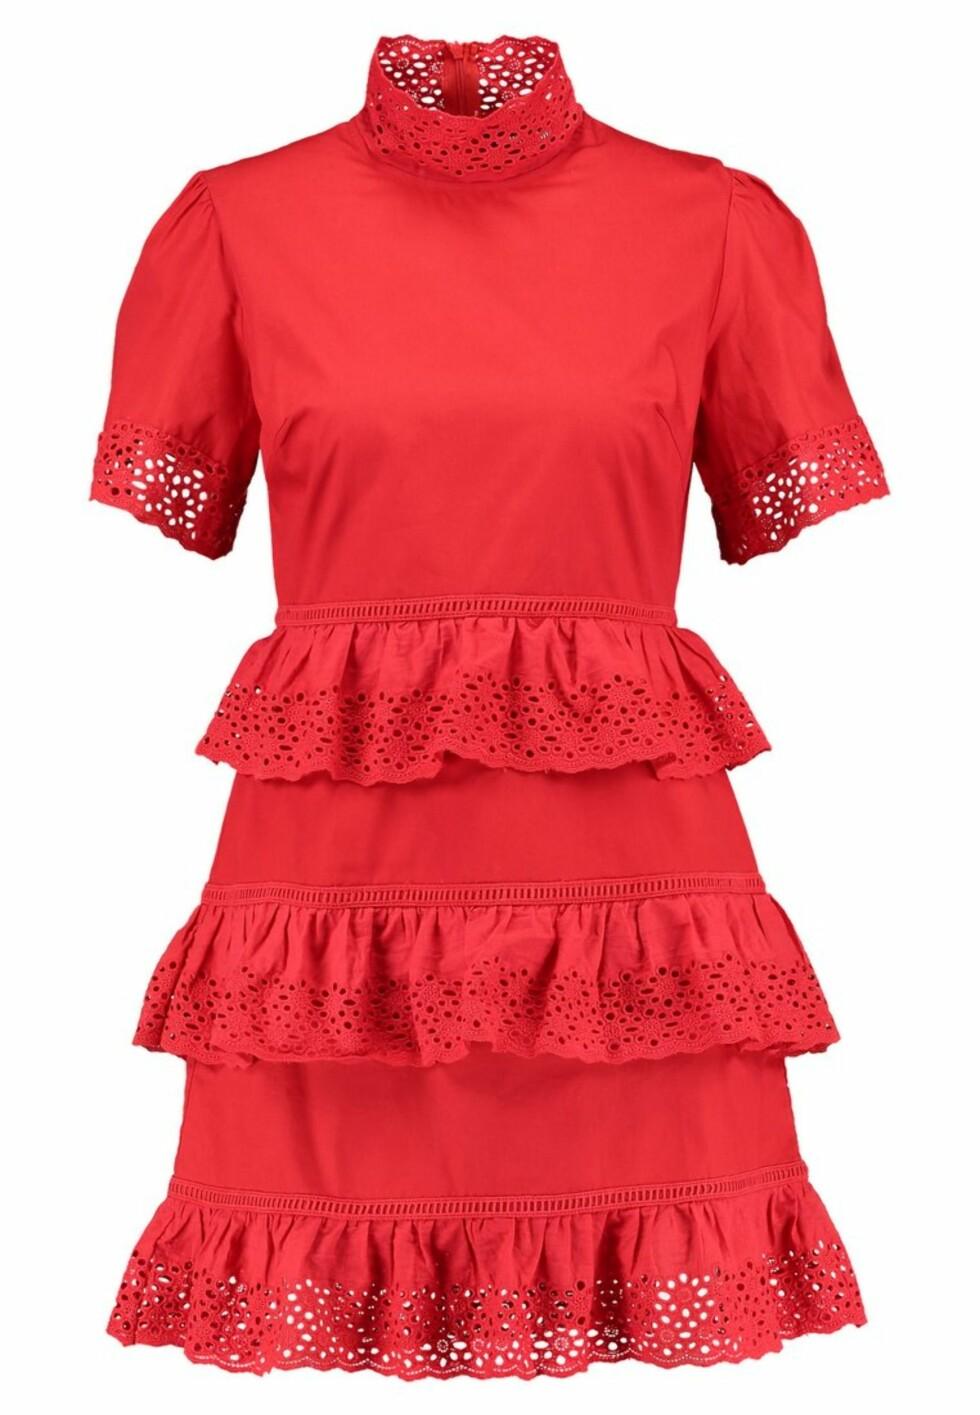 Kjole fra Fashion Union |599,-| https://www.zalando.no/fashion-union-nerissa-sommerkjole-red-faa21c042-g11.html